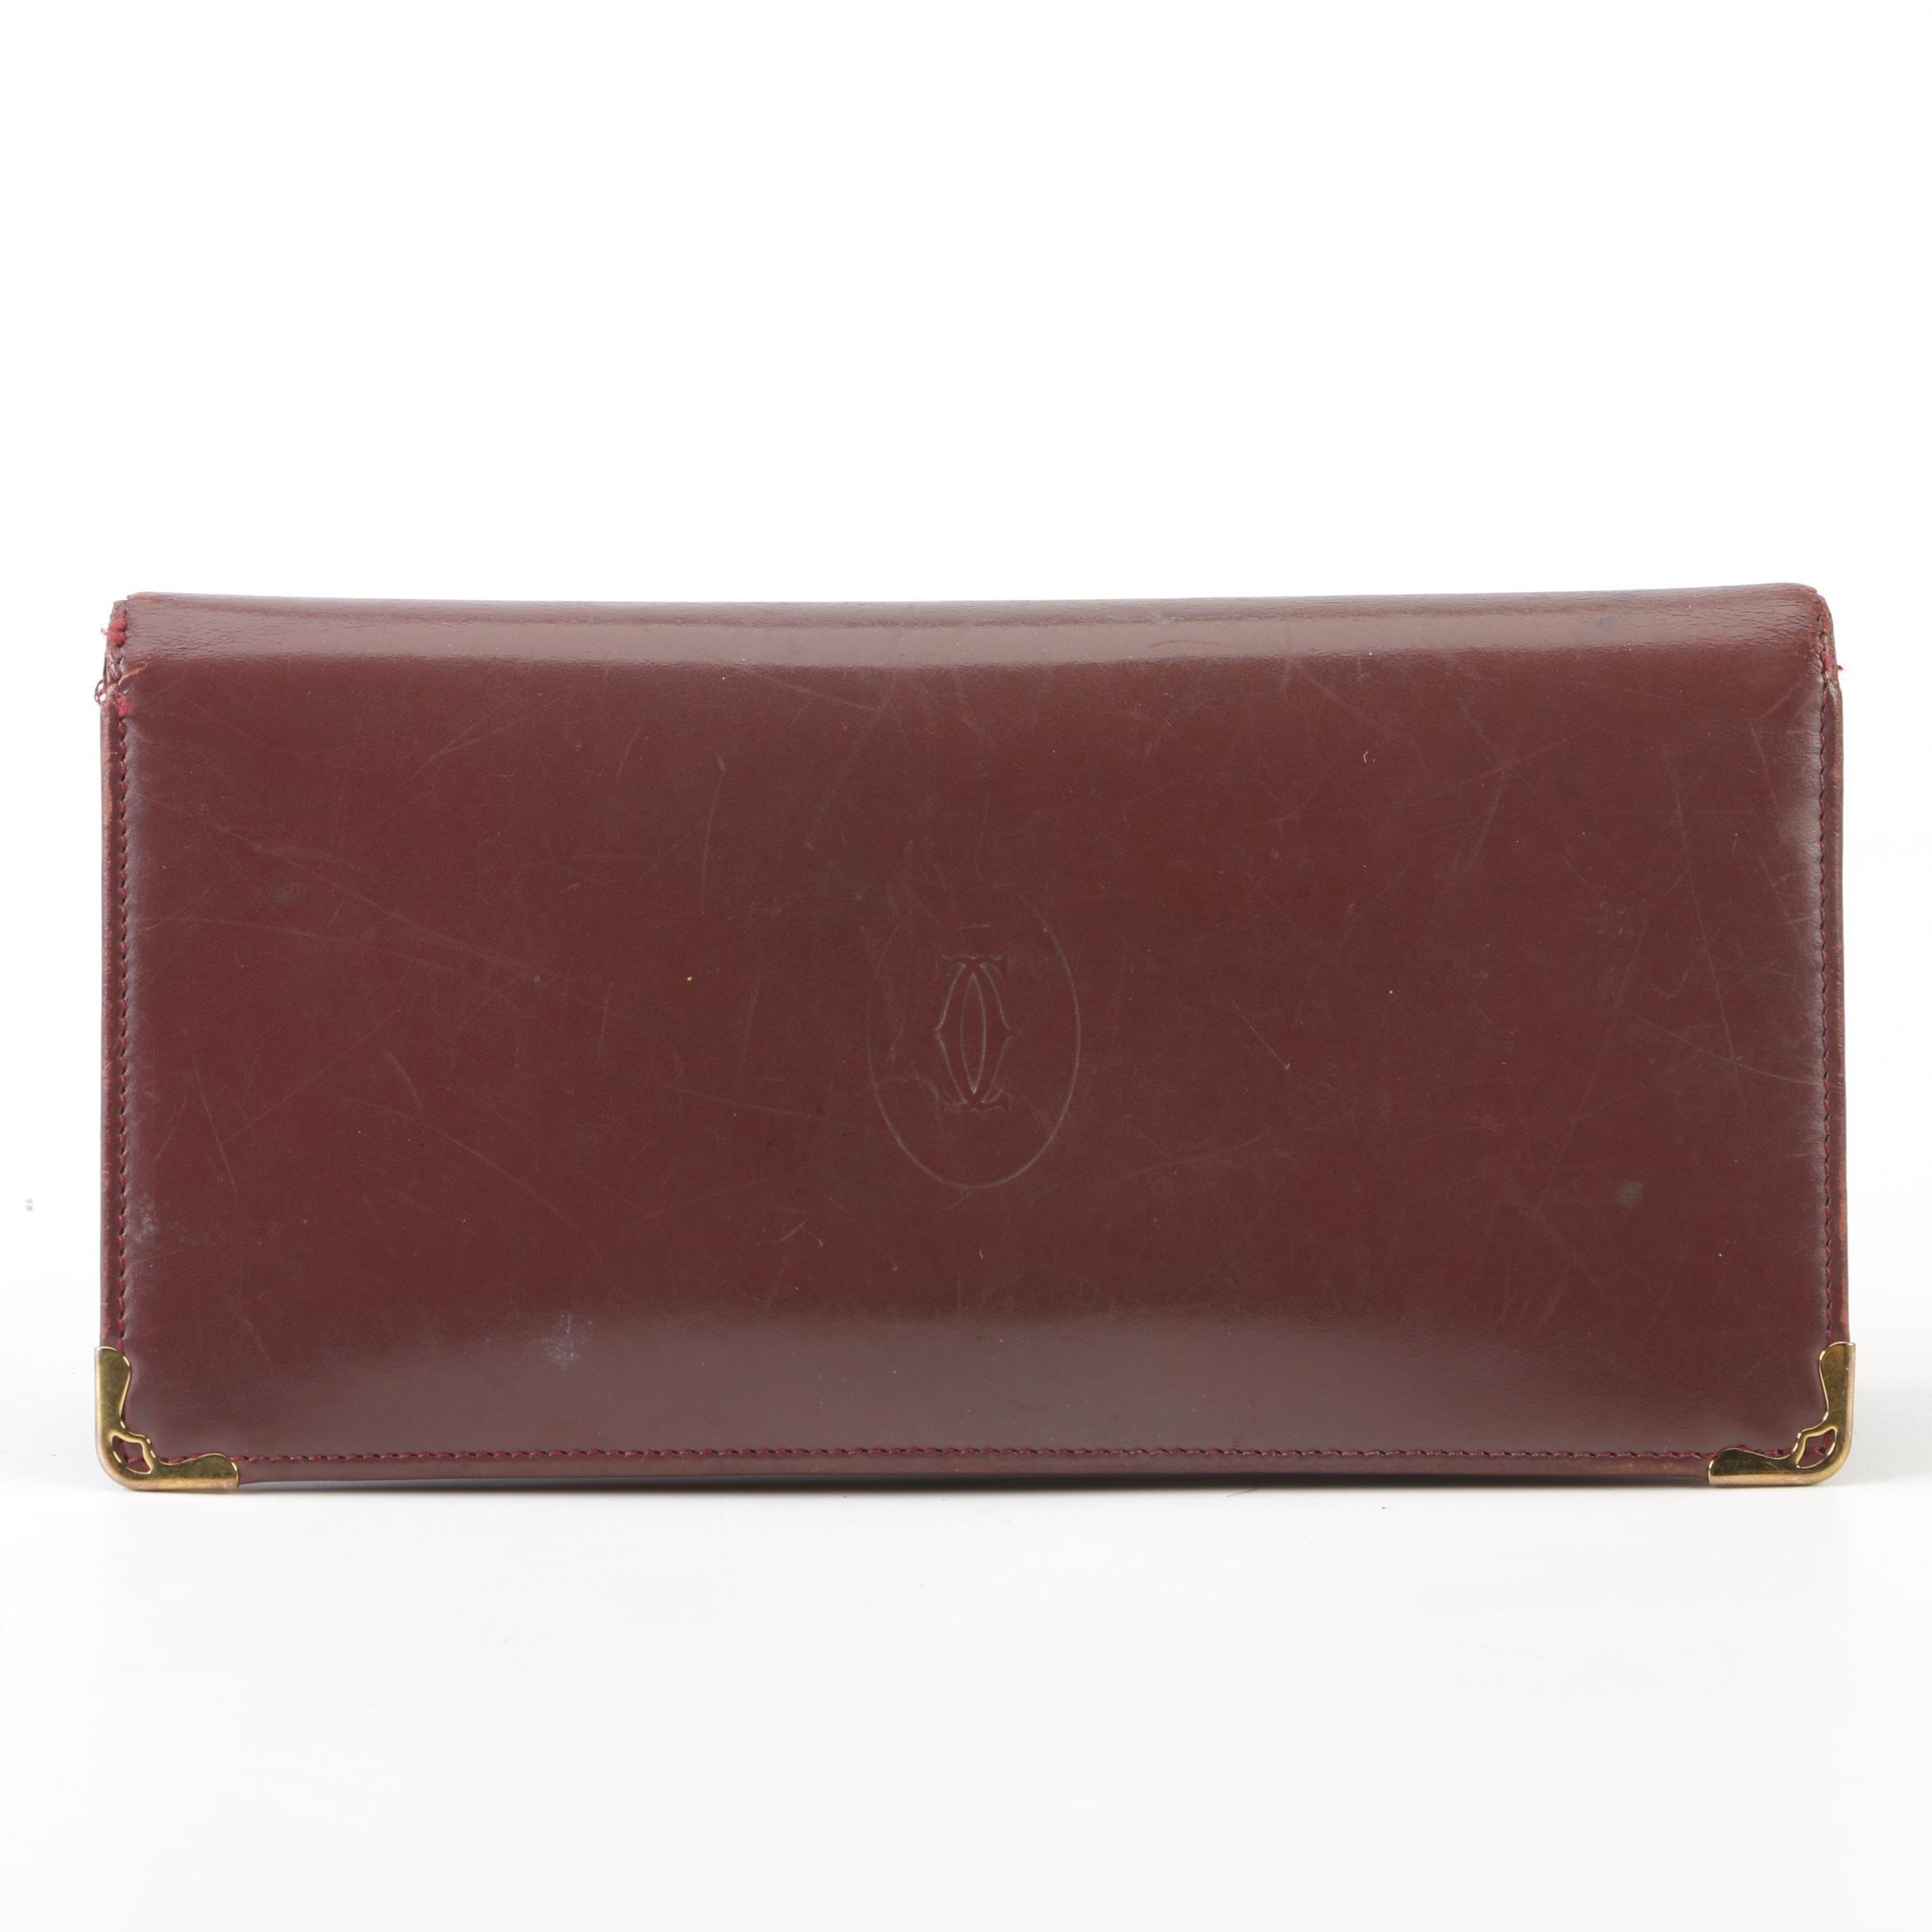 Cartier Paris Burgundy Box Calf Leather Long Wallet with Corner Accents, Vintage